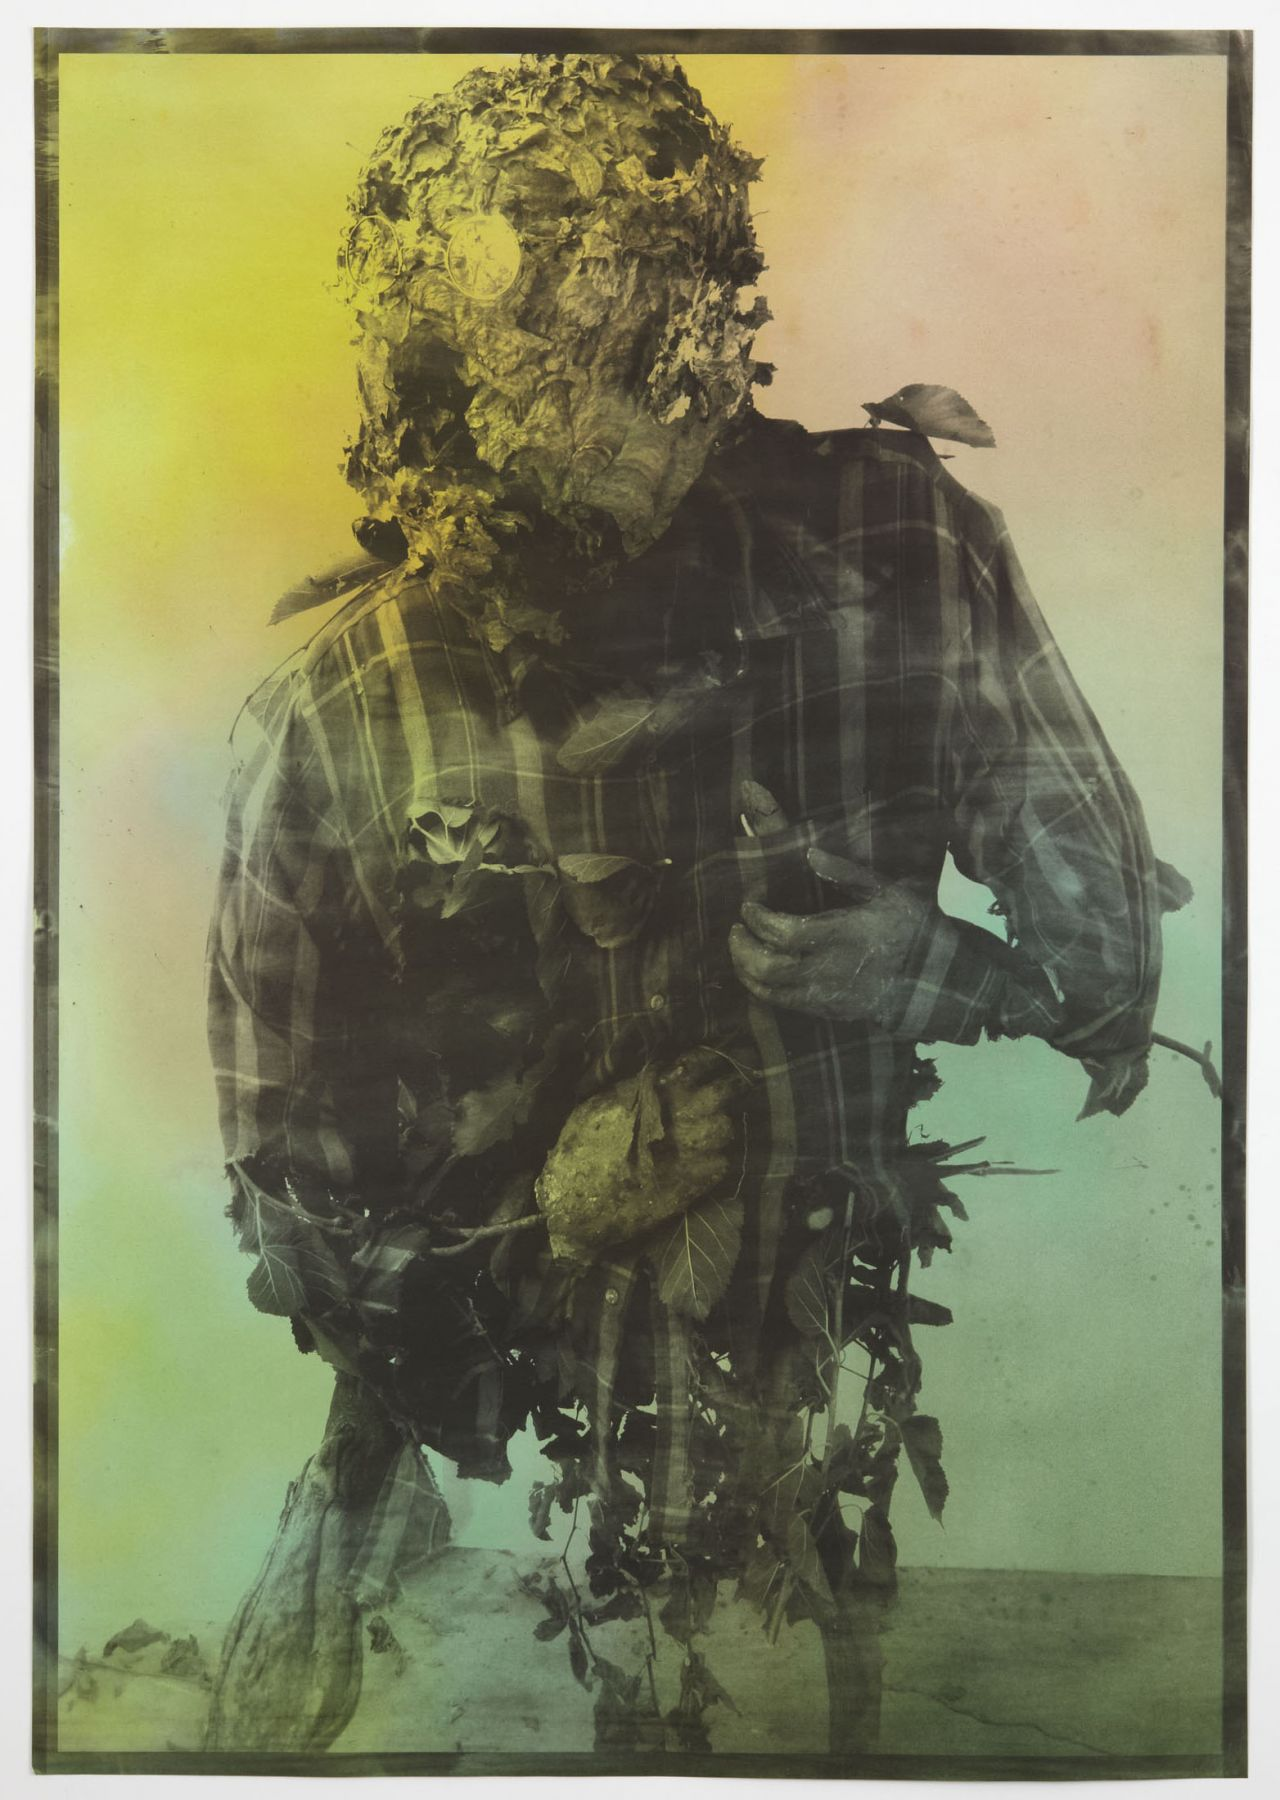 Civilian (Howling), 2010, Hand-dyed palladium print